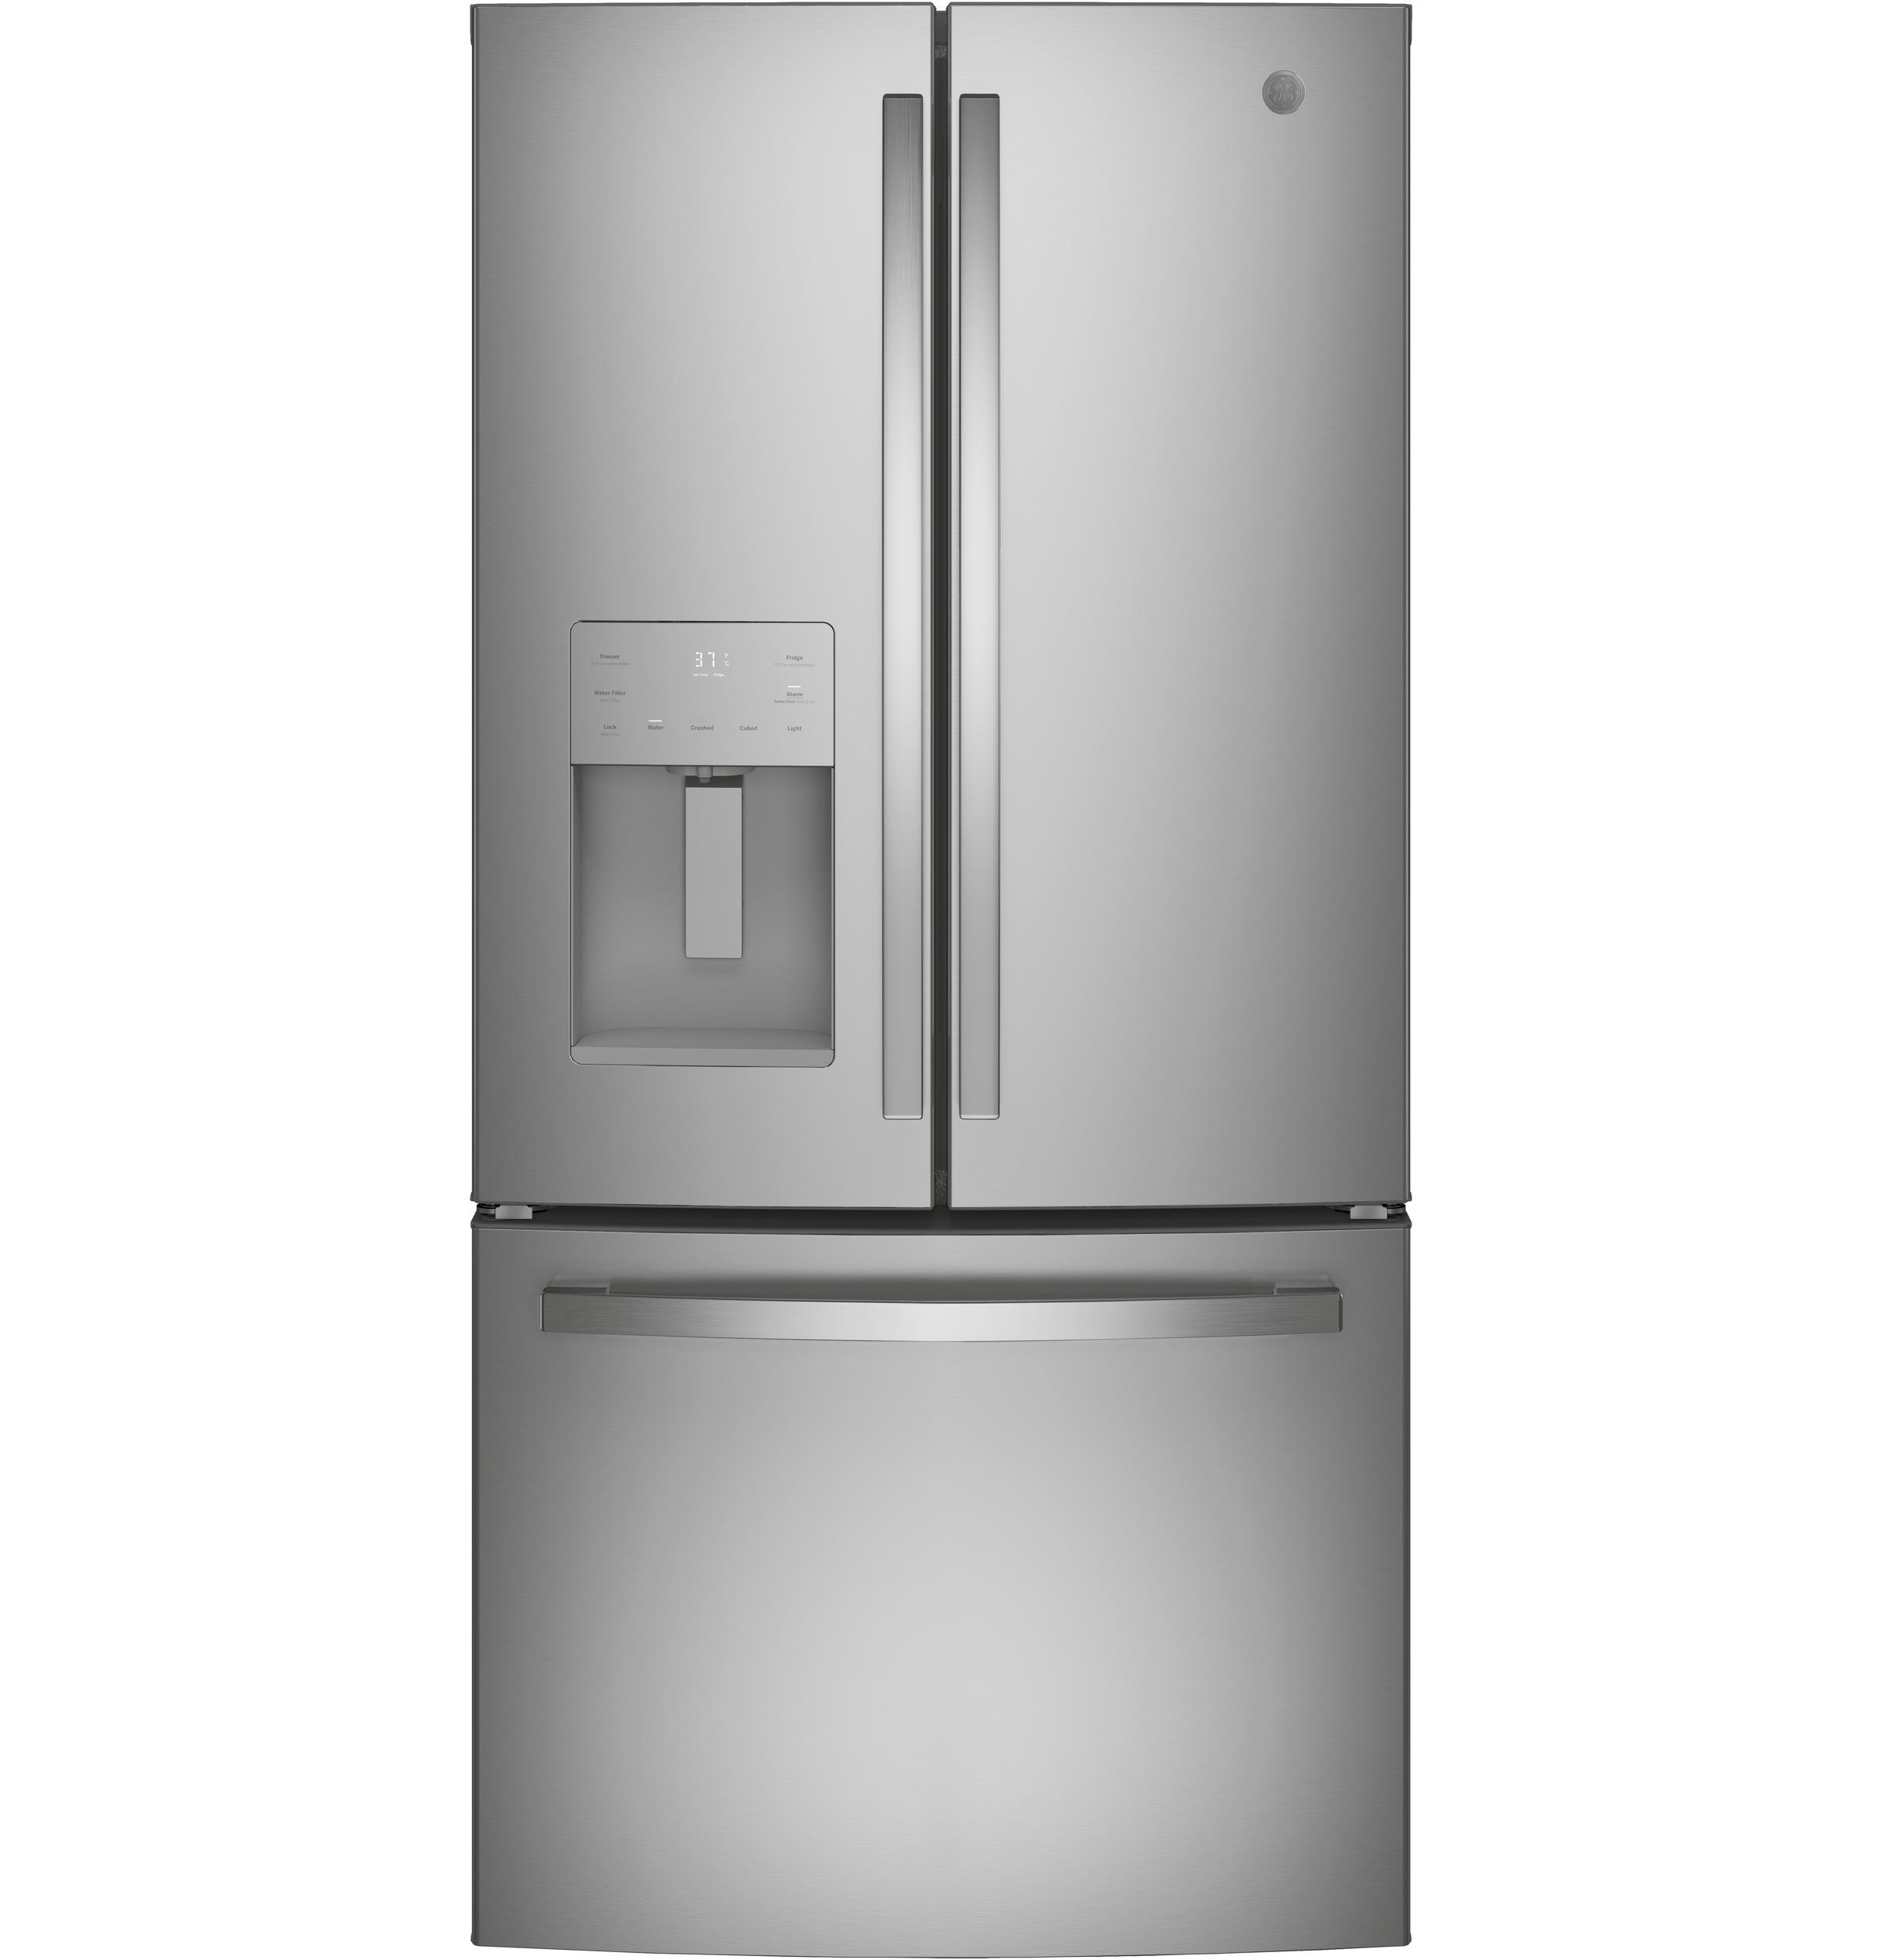 GE GE® ENERGY STAR® 17.5 Cu. Ft. Counter-Depth French-Door Refrigerator